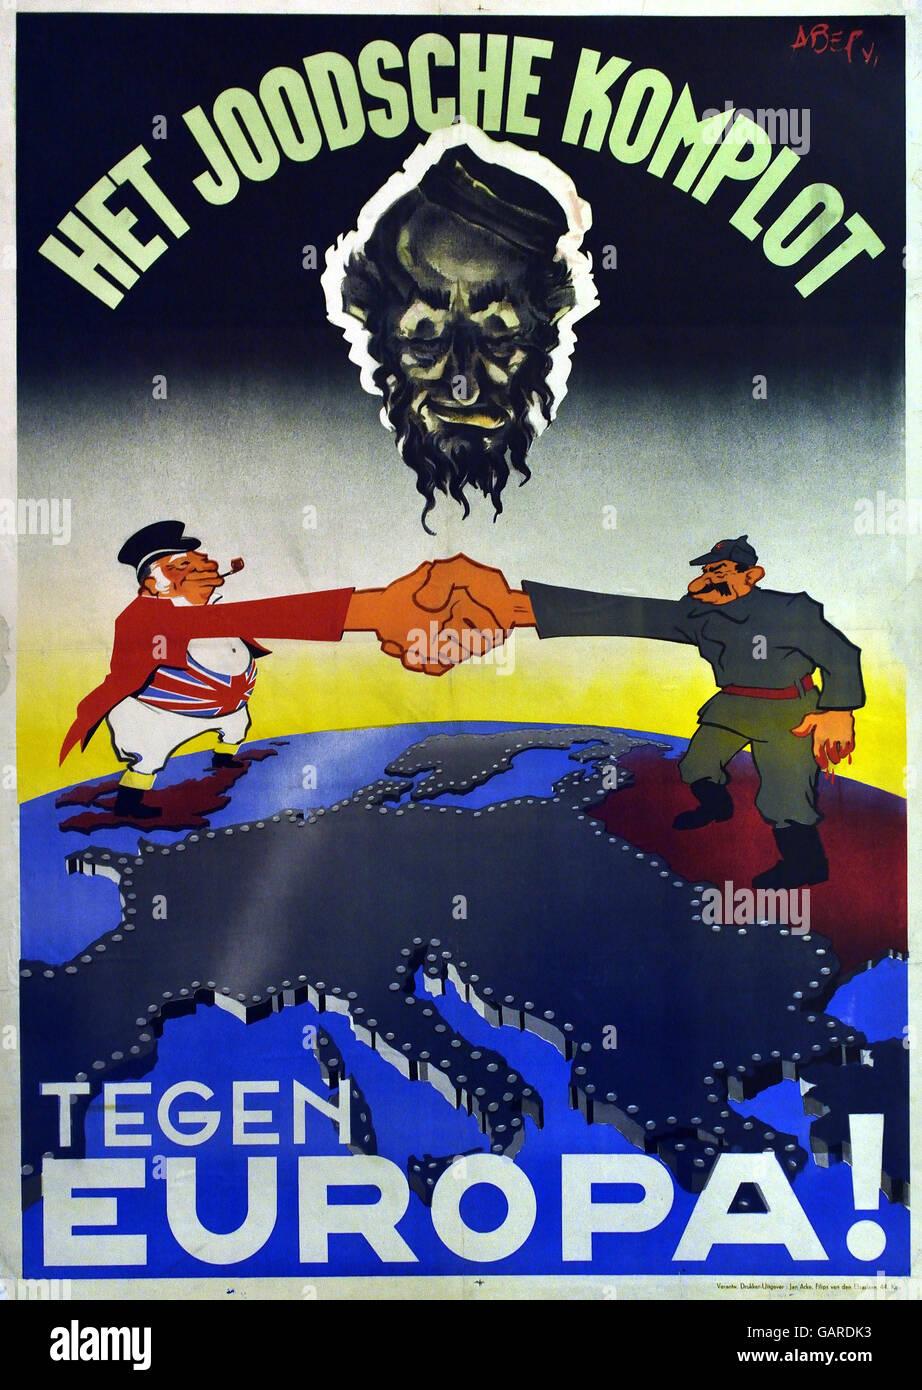 Het Joodsche Komplot tegen Europa - The Jewish Conspiracy against Europe Dutch Newspaper Netherlands - Stock Image